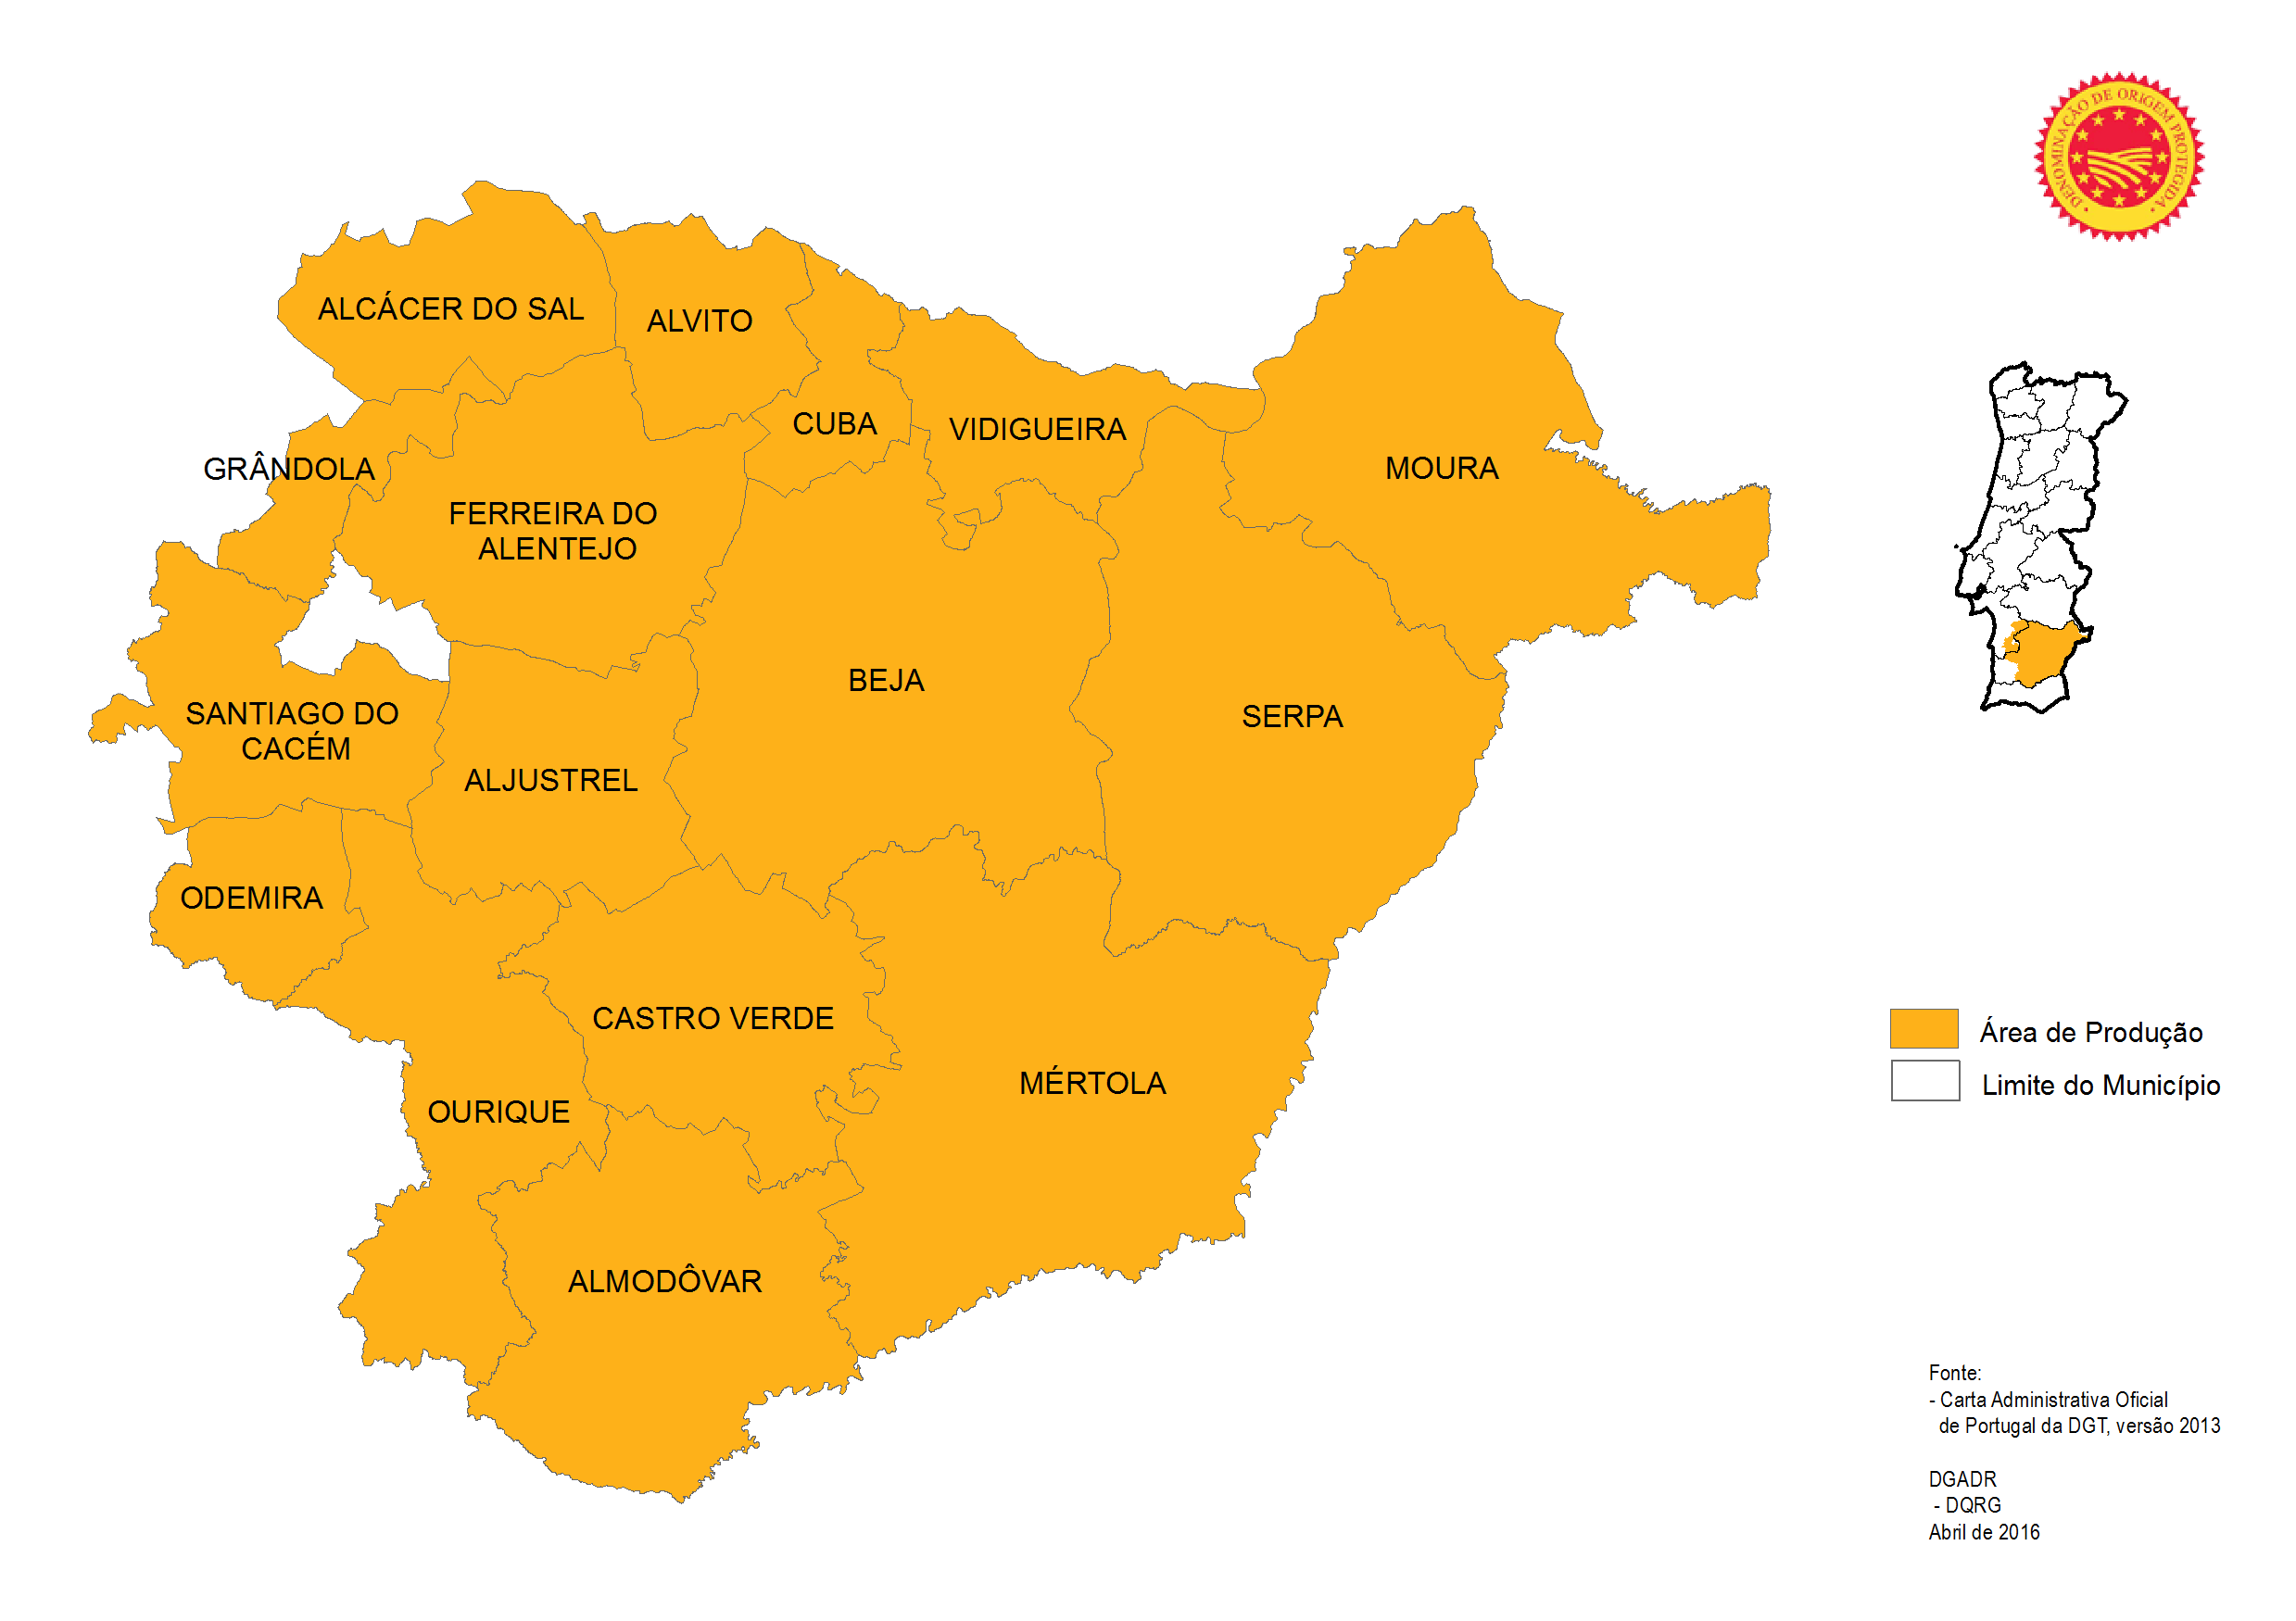 mapa de portugal serpa Produtos Tradicionais Portugueses   Queijo Serpa DOP mapa de portugal serpa